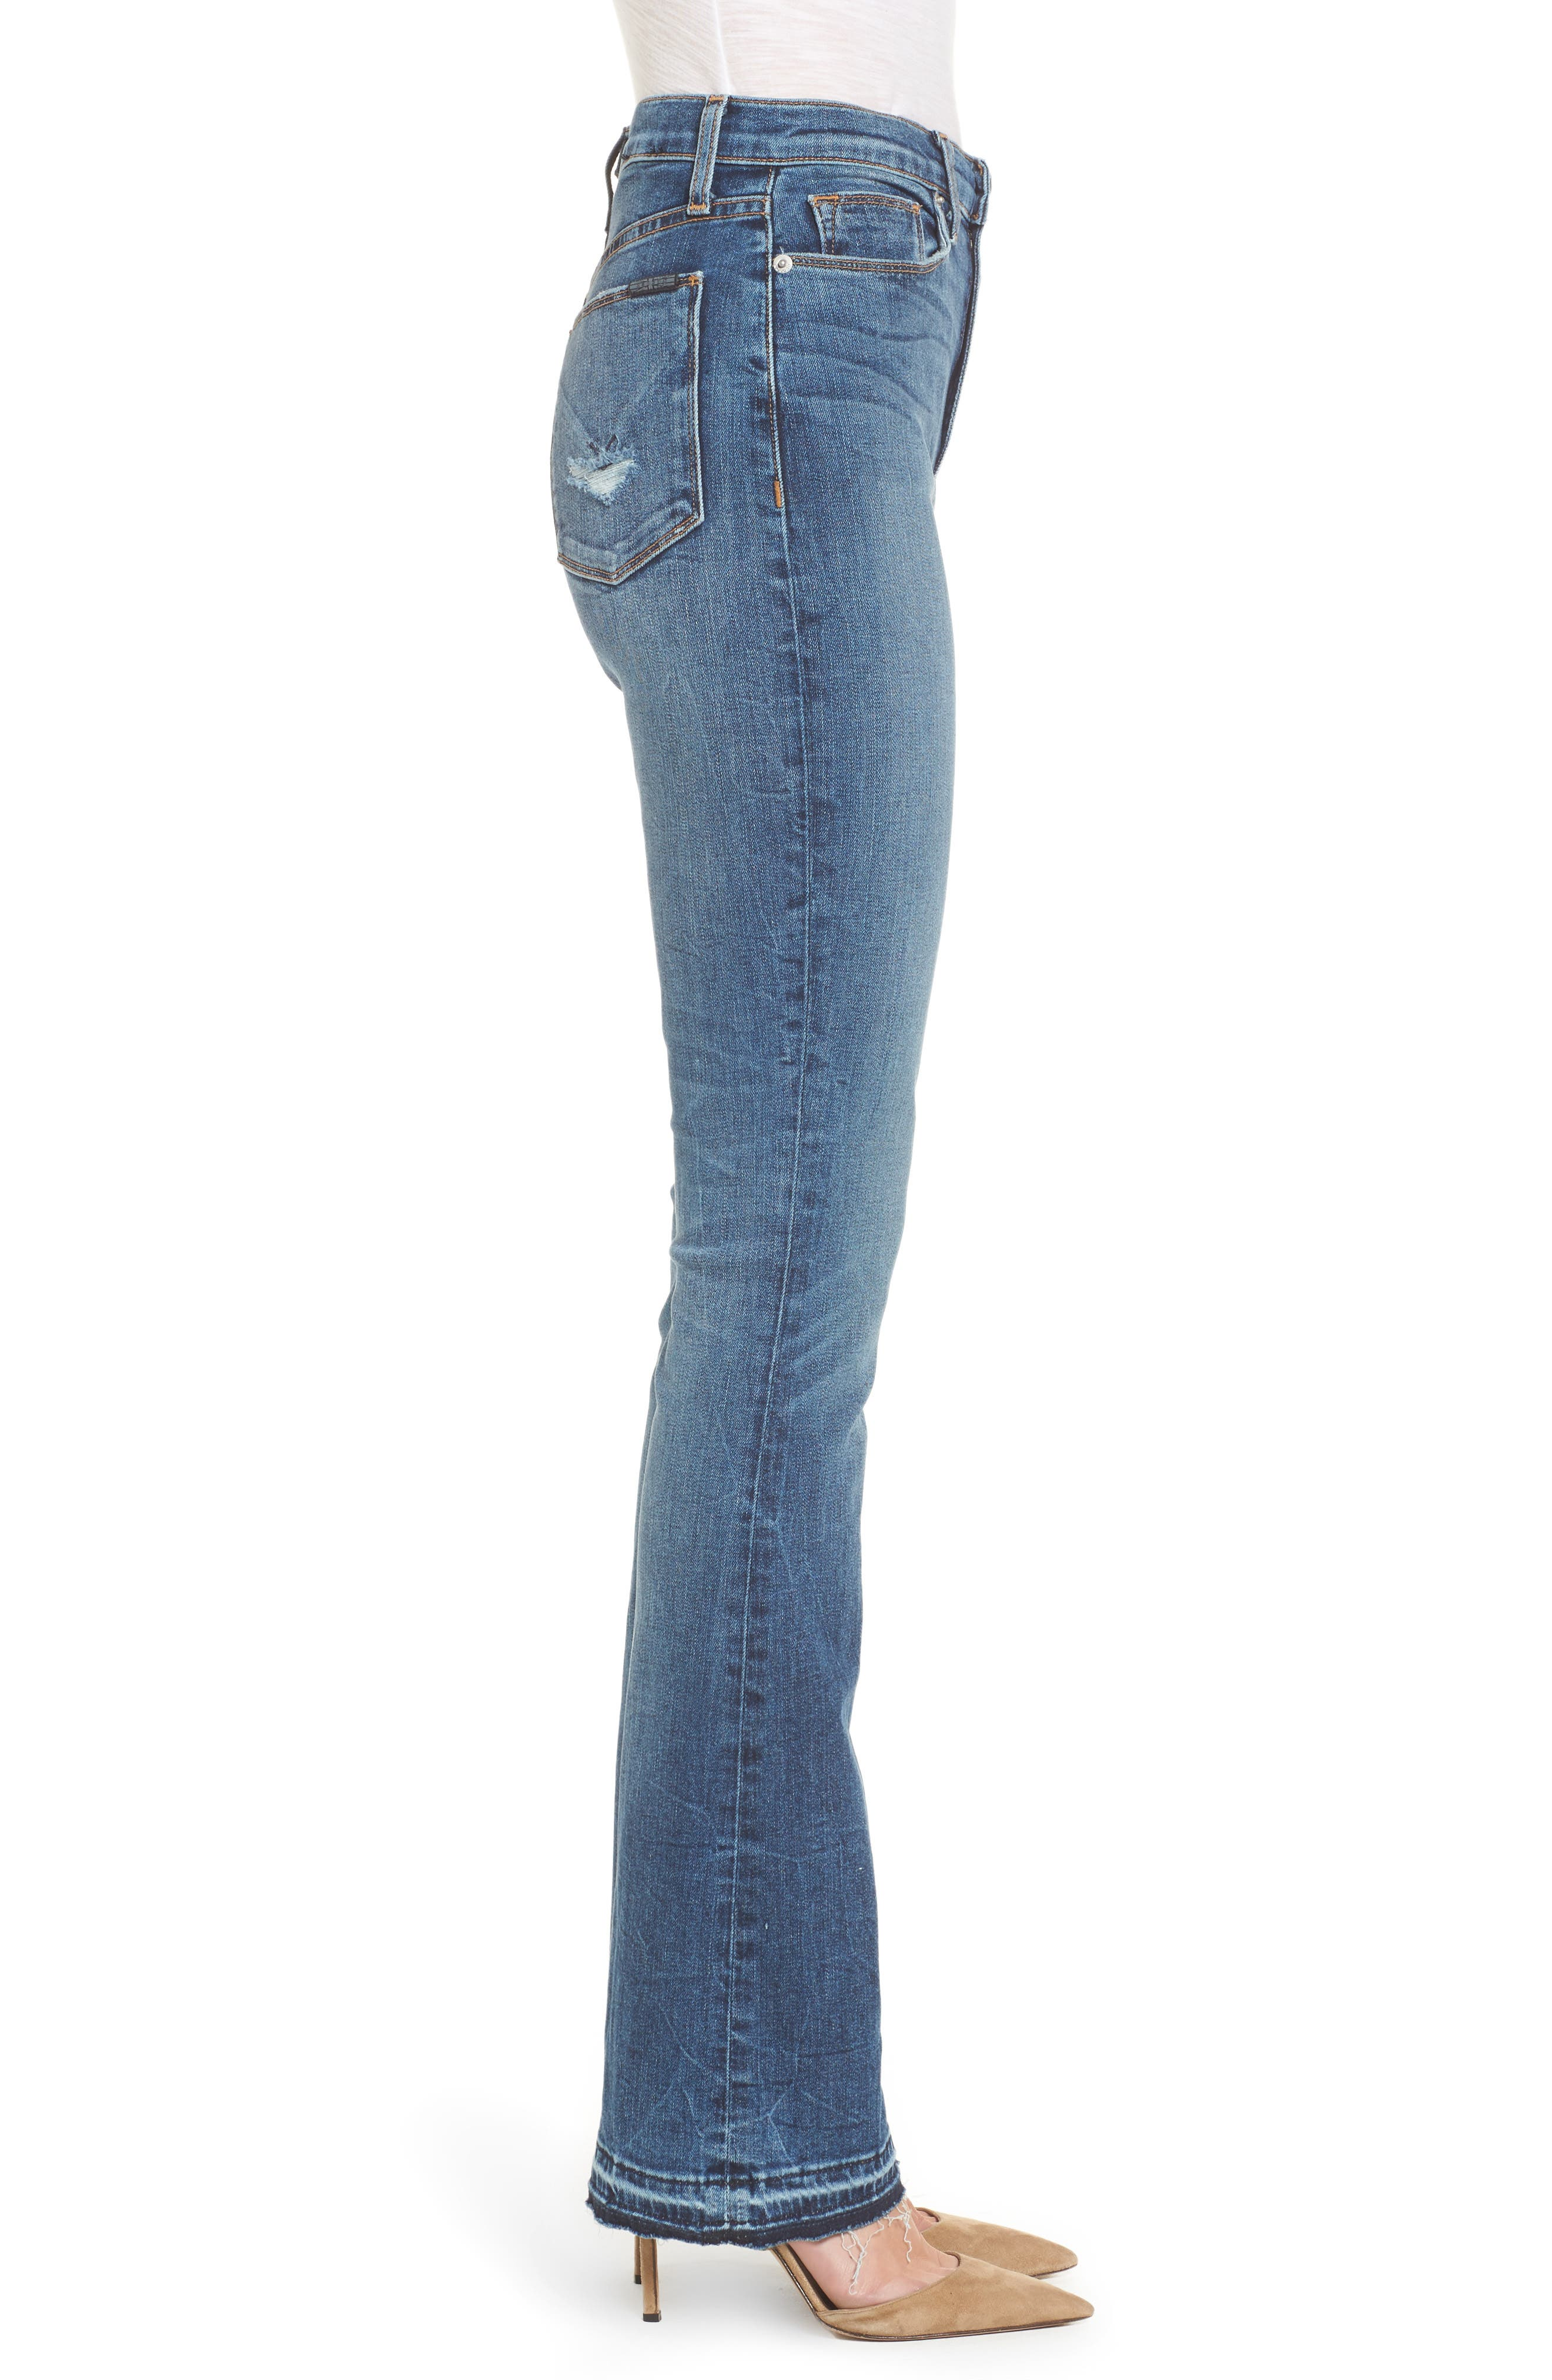 Heartbreaker High Waist Bootcut Jeans,                             Alternate thumbnail 3, color,                             SPLIT SECOND